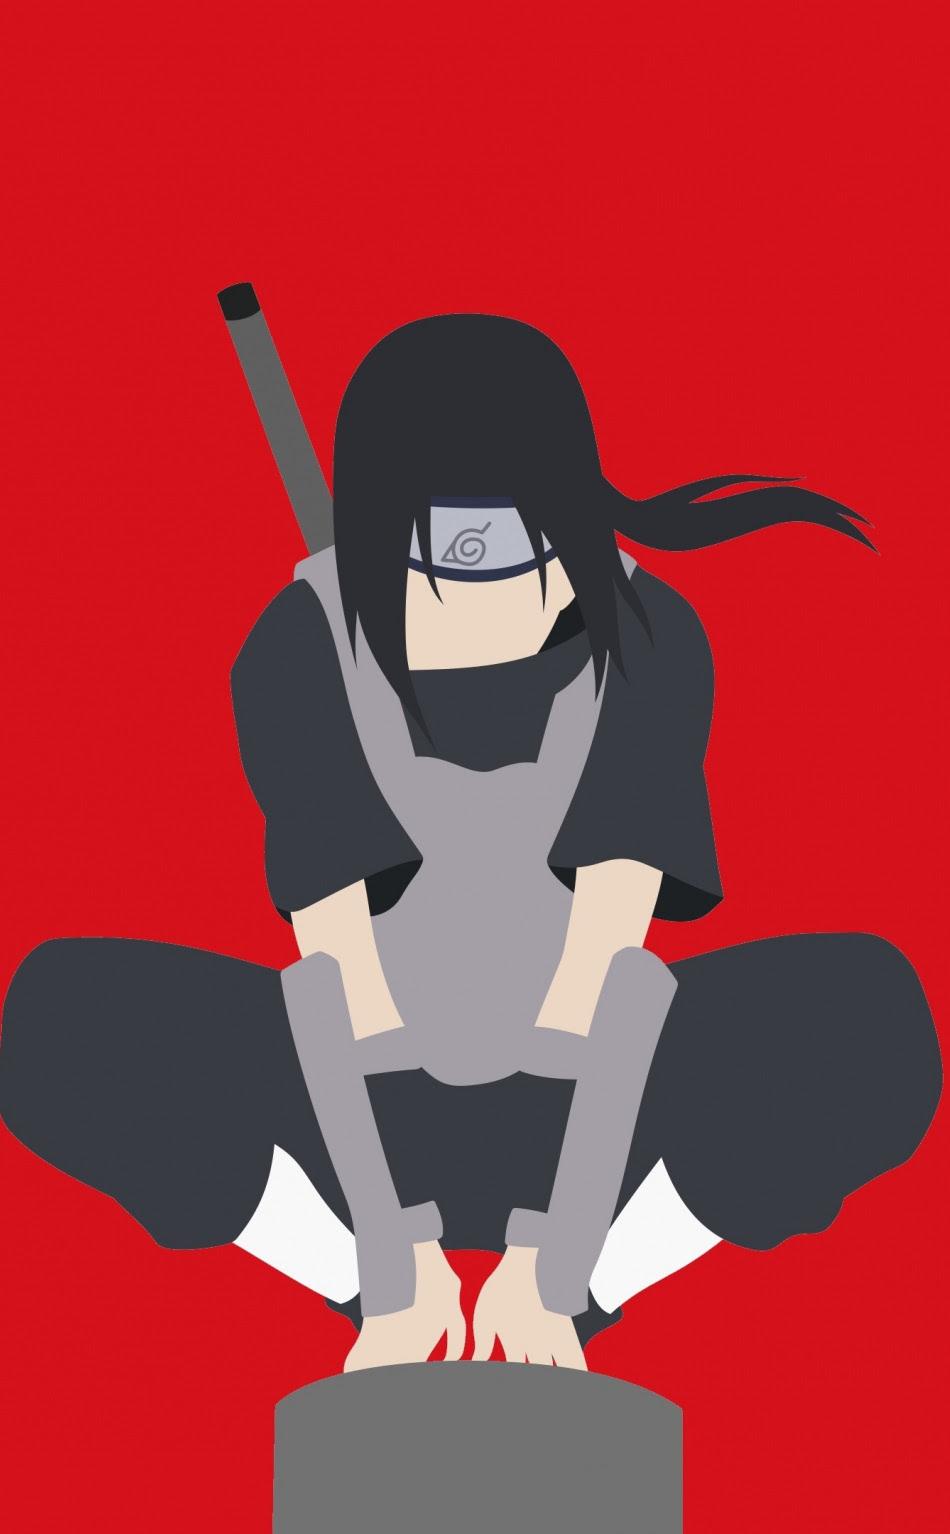 Naruto Wallpaper Iphone 6 Trumpwallpapers